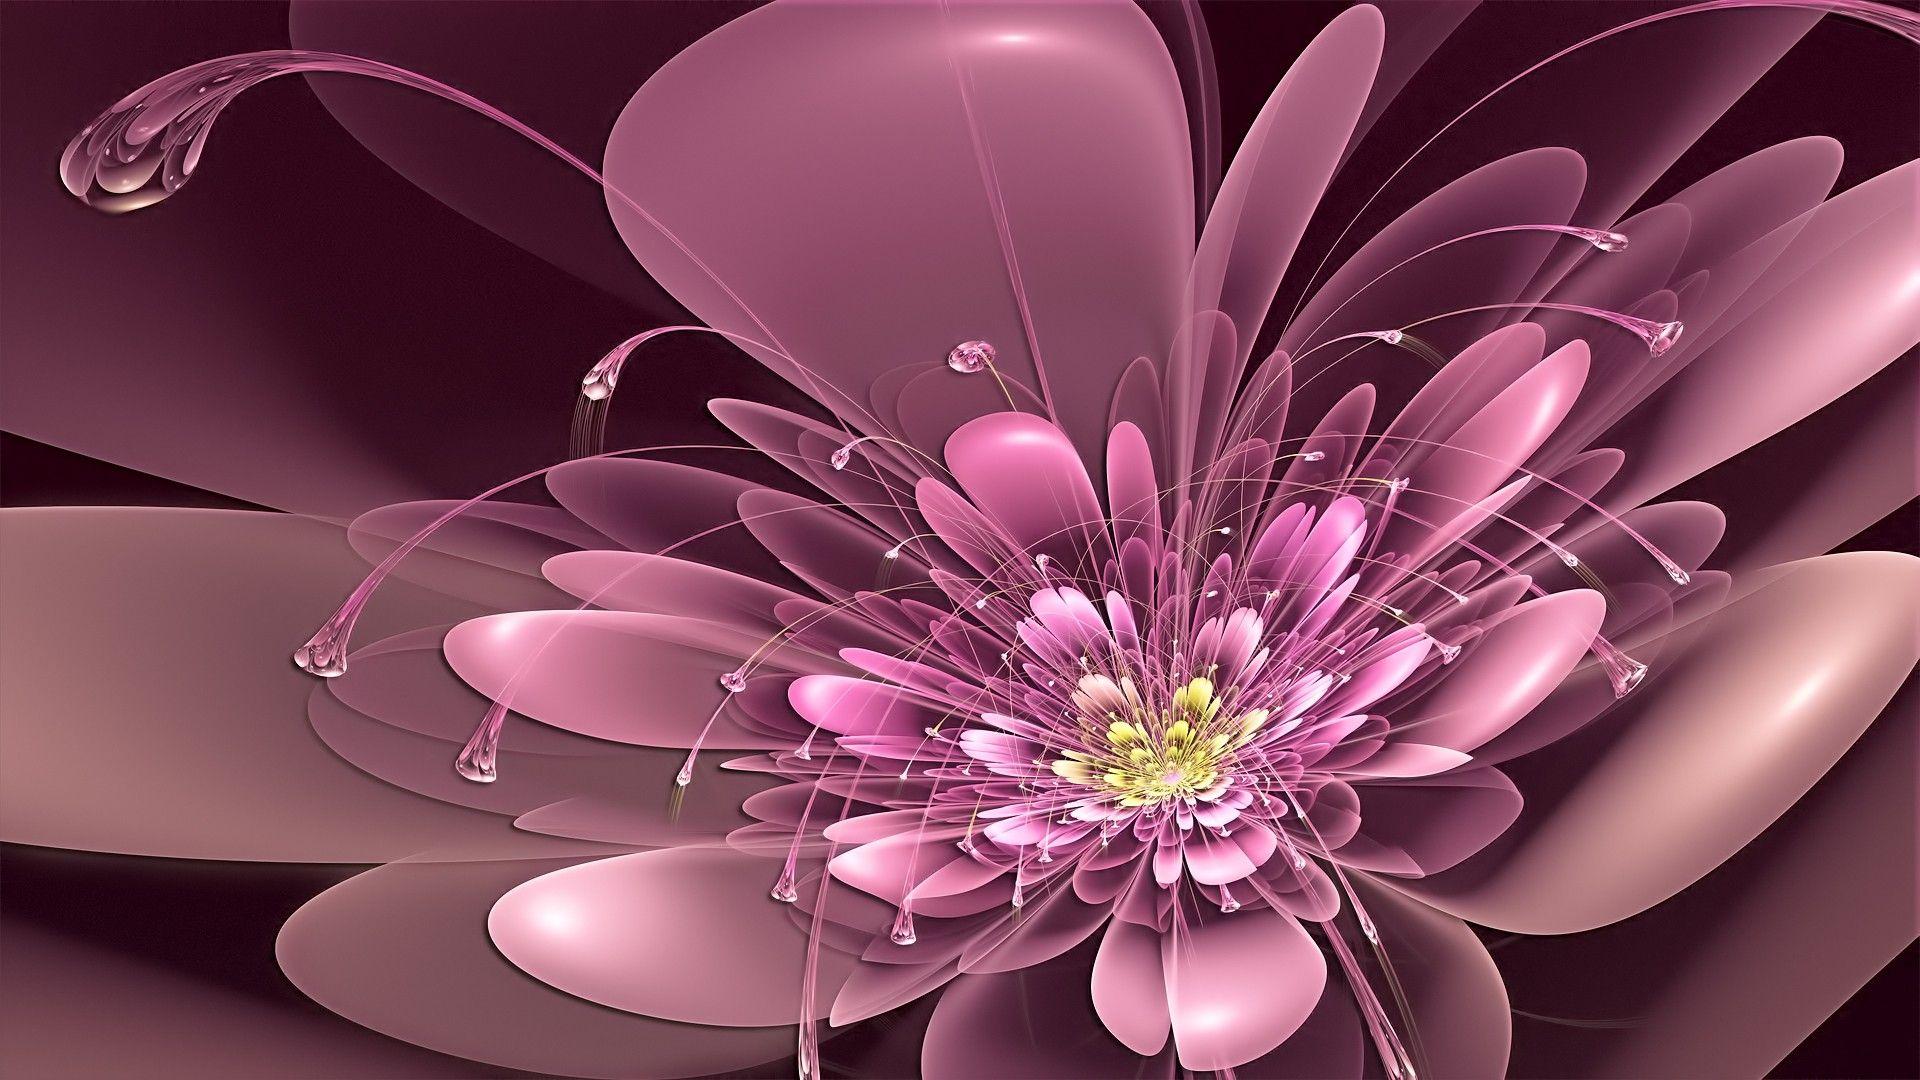 Wallpaper Abstract Flowers For Desktop